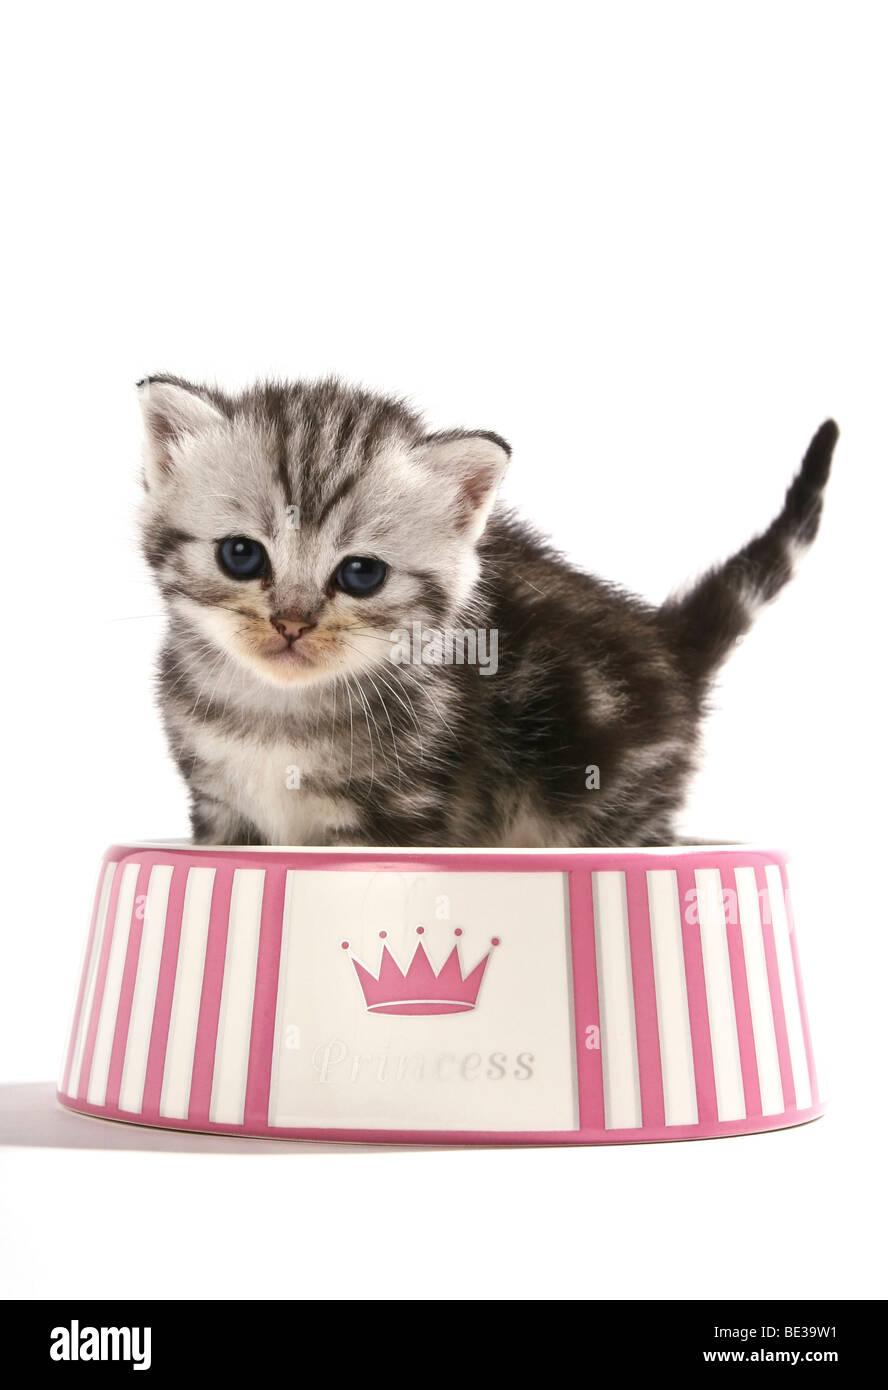 British Shorthair kitten in a feeding dish - Stock Image